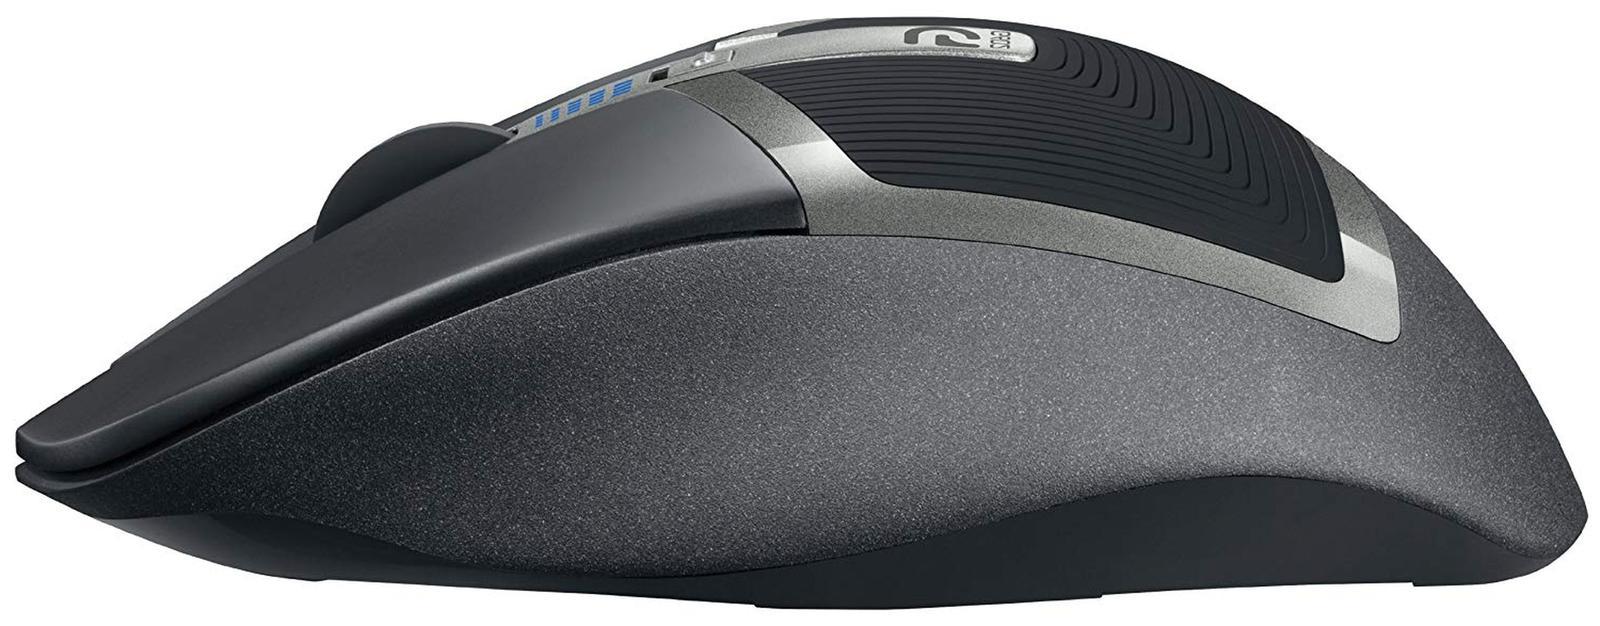 Logitech G602 Lag-Free Mouse 11 Buttons, DPI